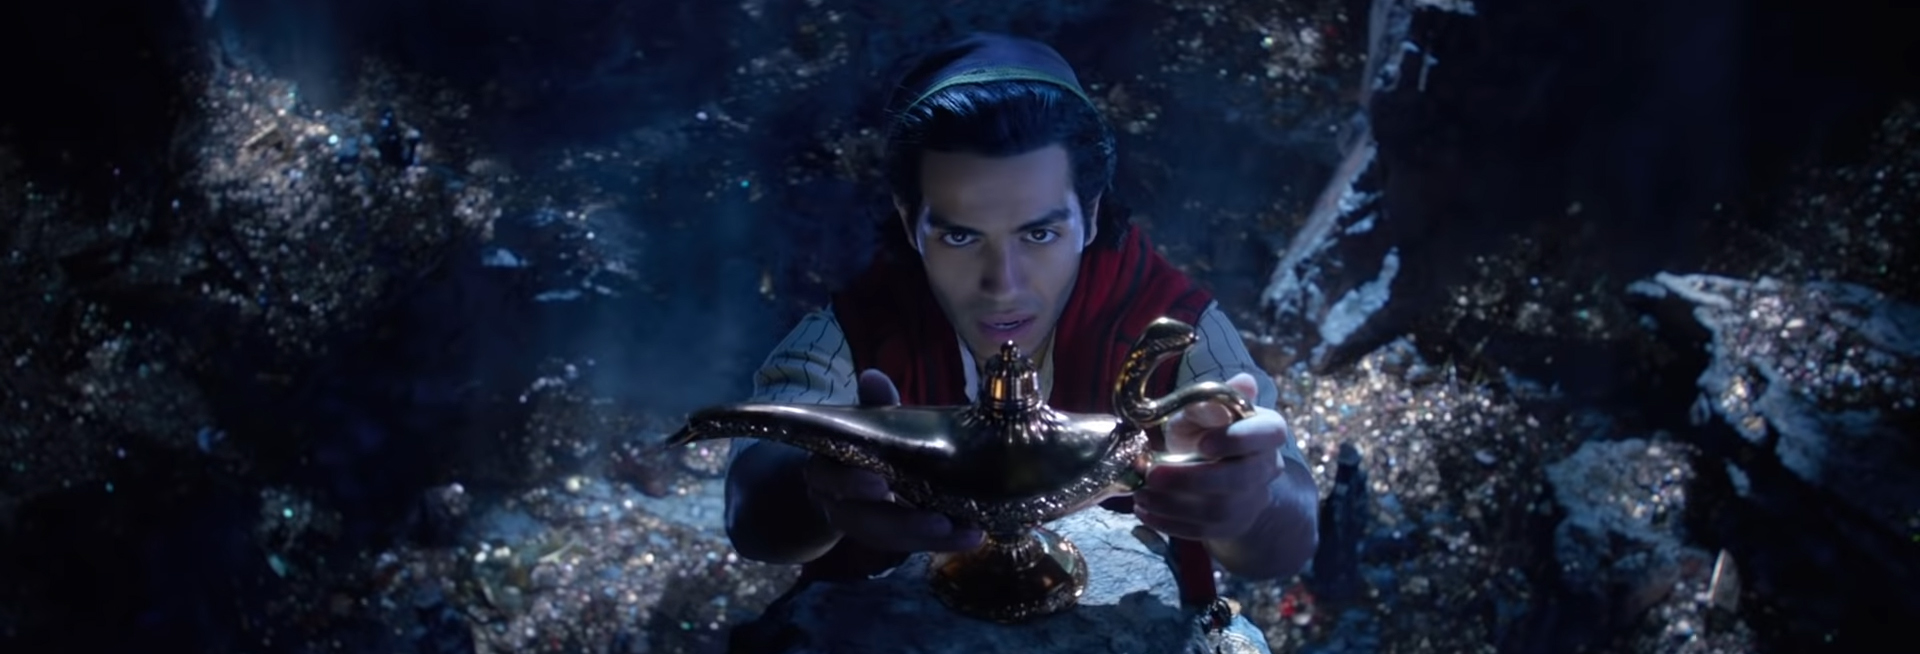 Aladdin (2019). Image Credit: Disney.